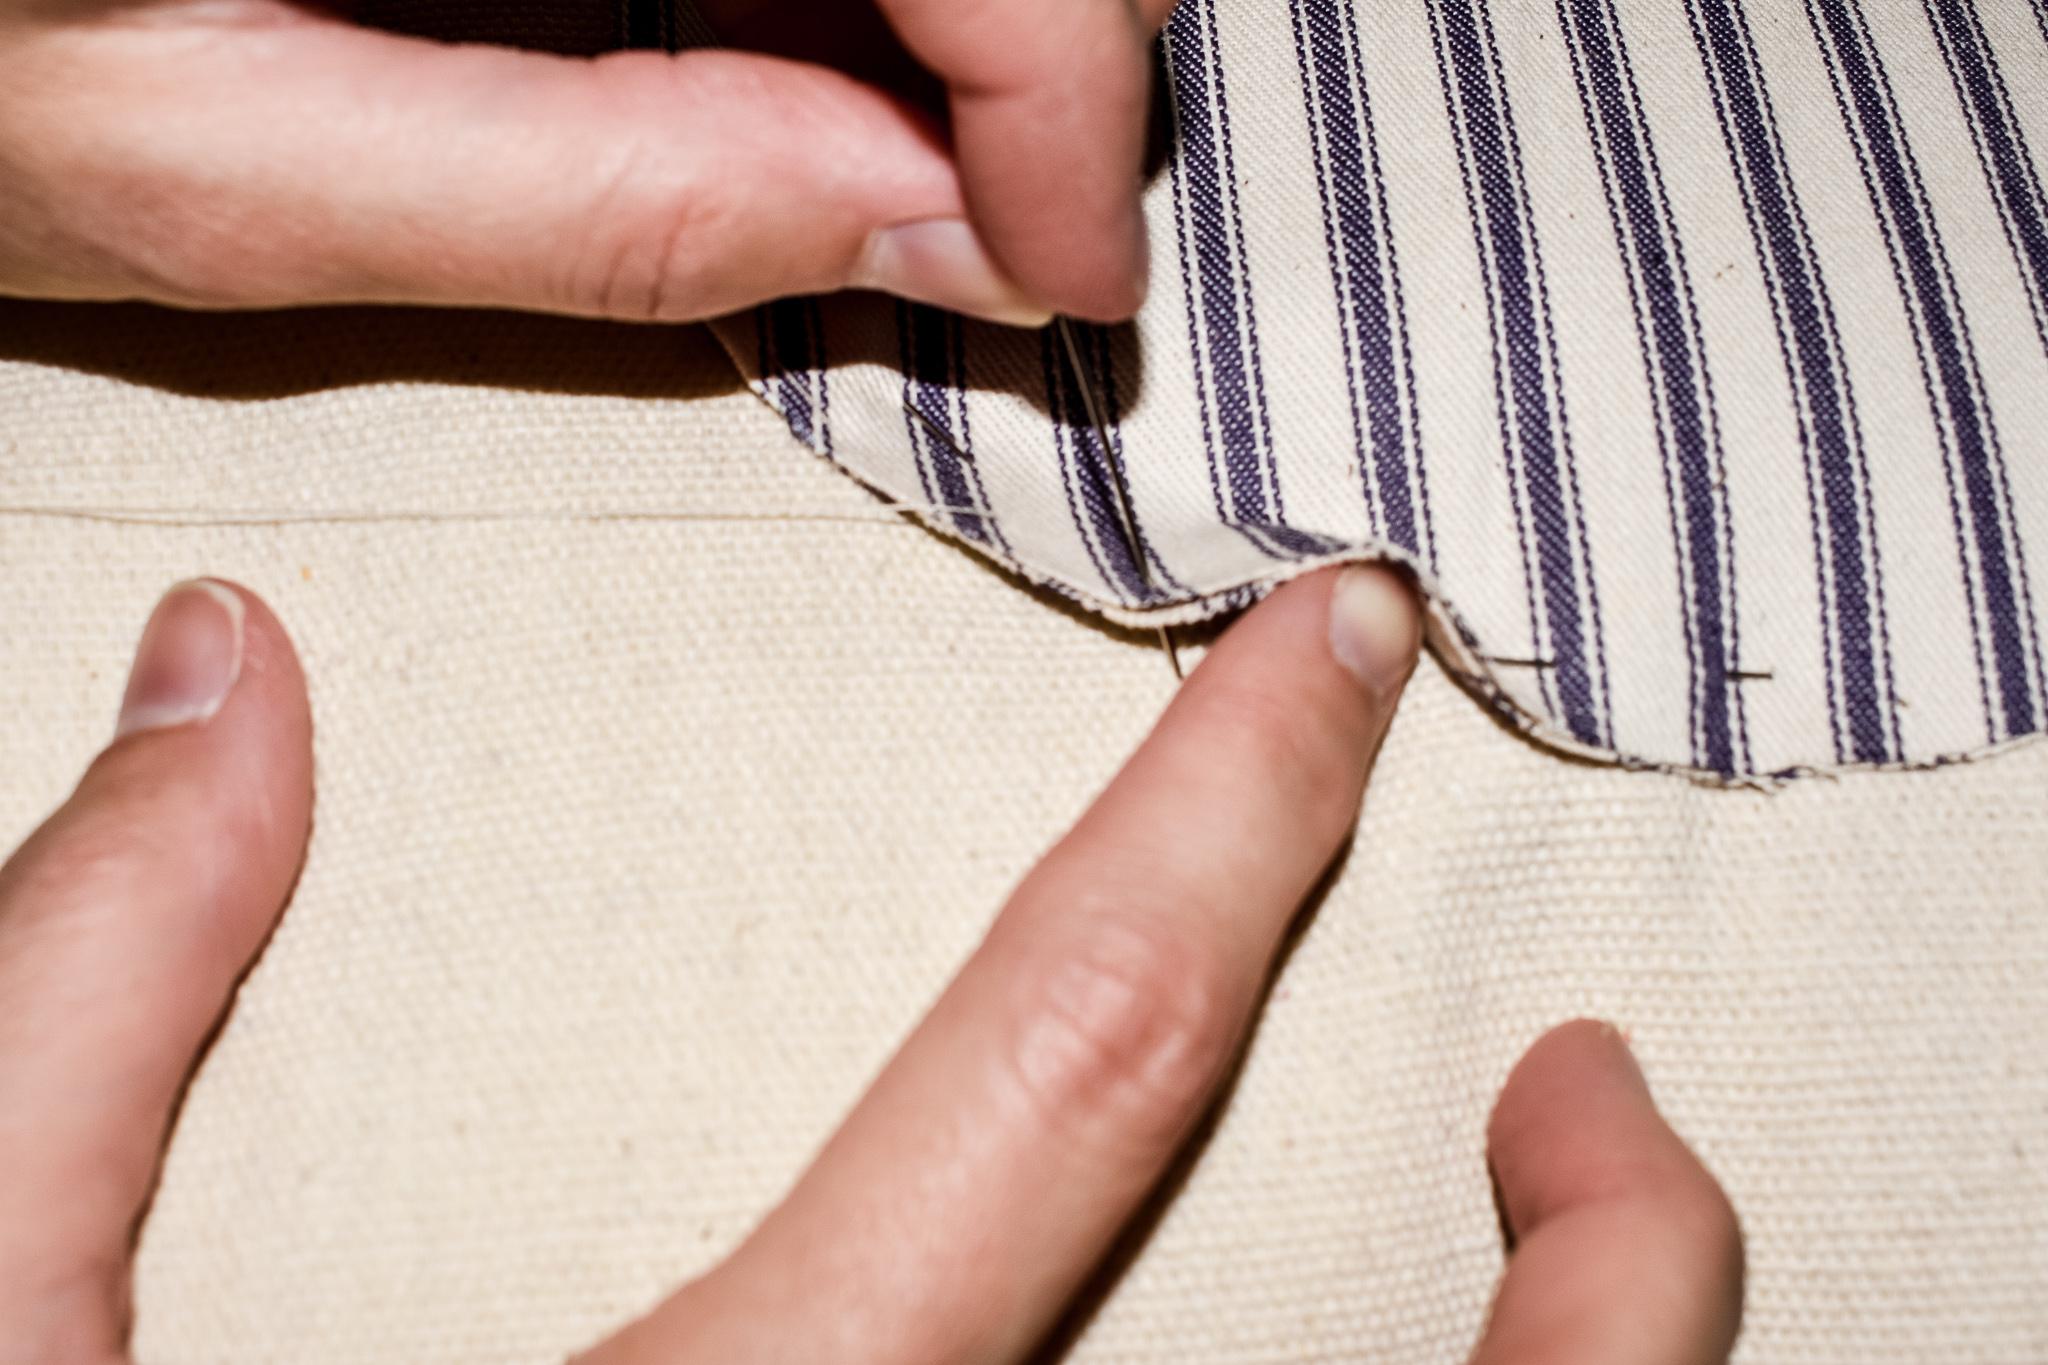 sewing a running stitch